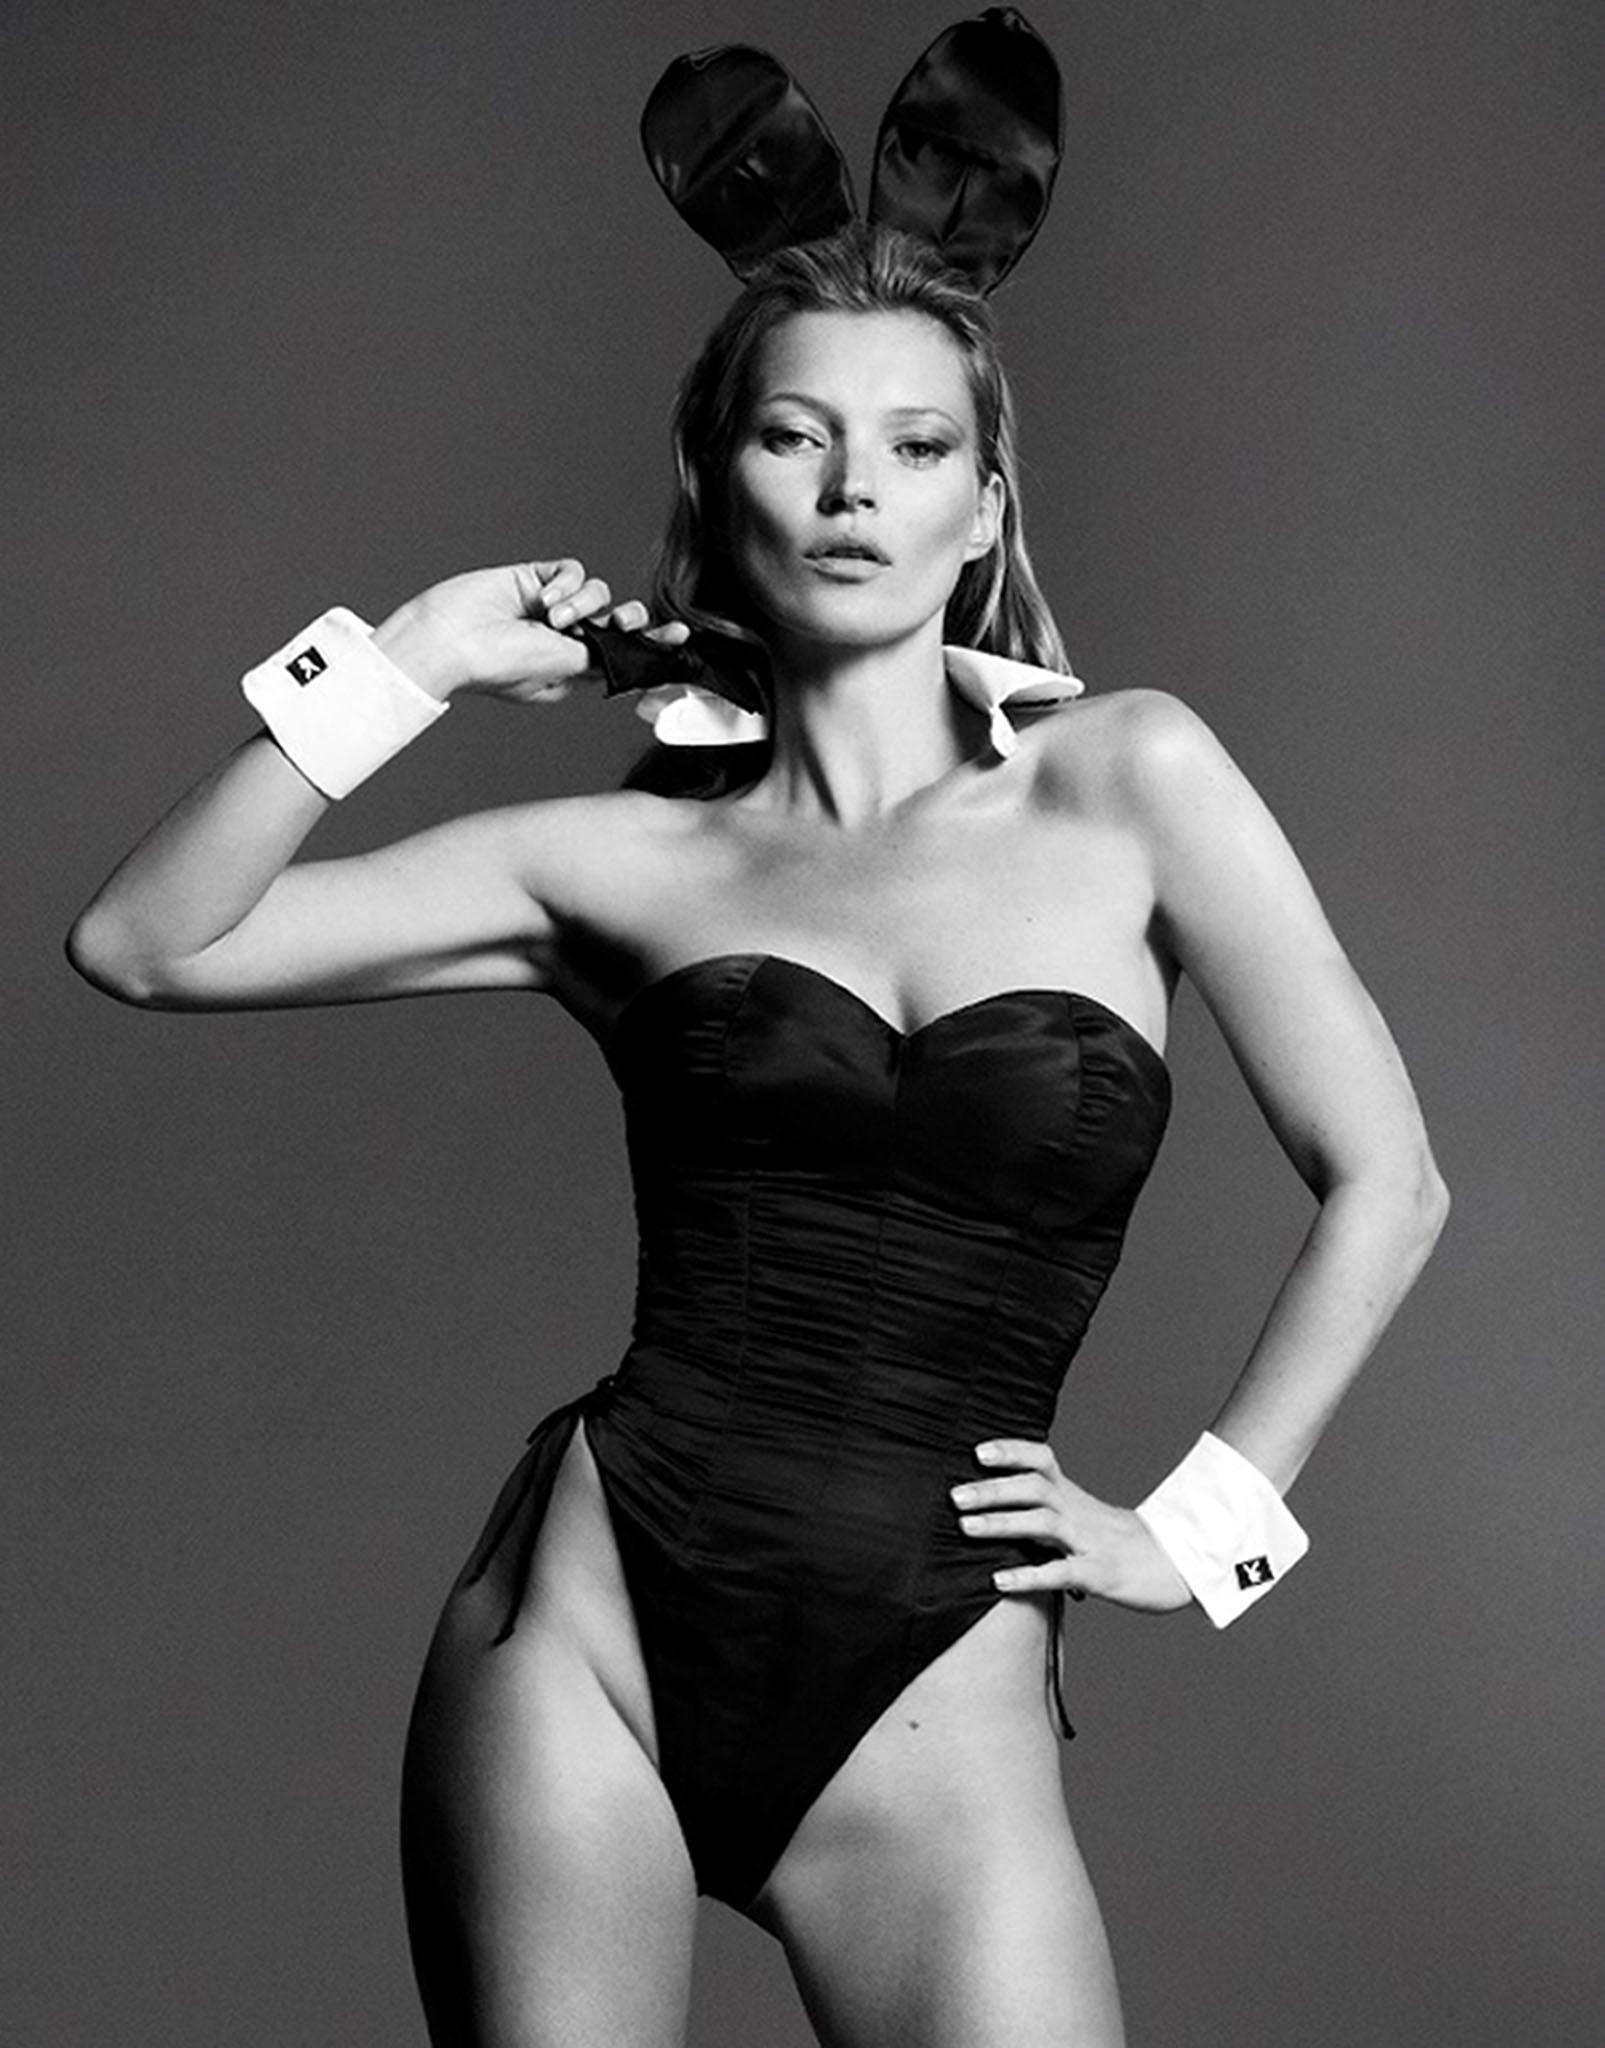 Indonesian top model nude photo